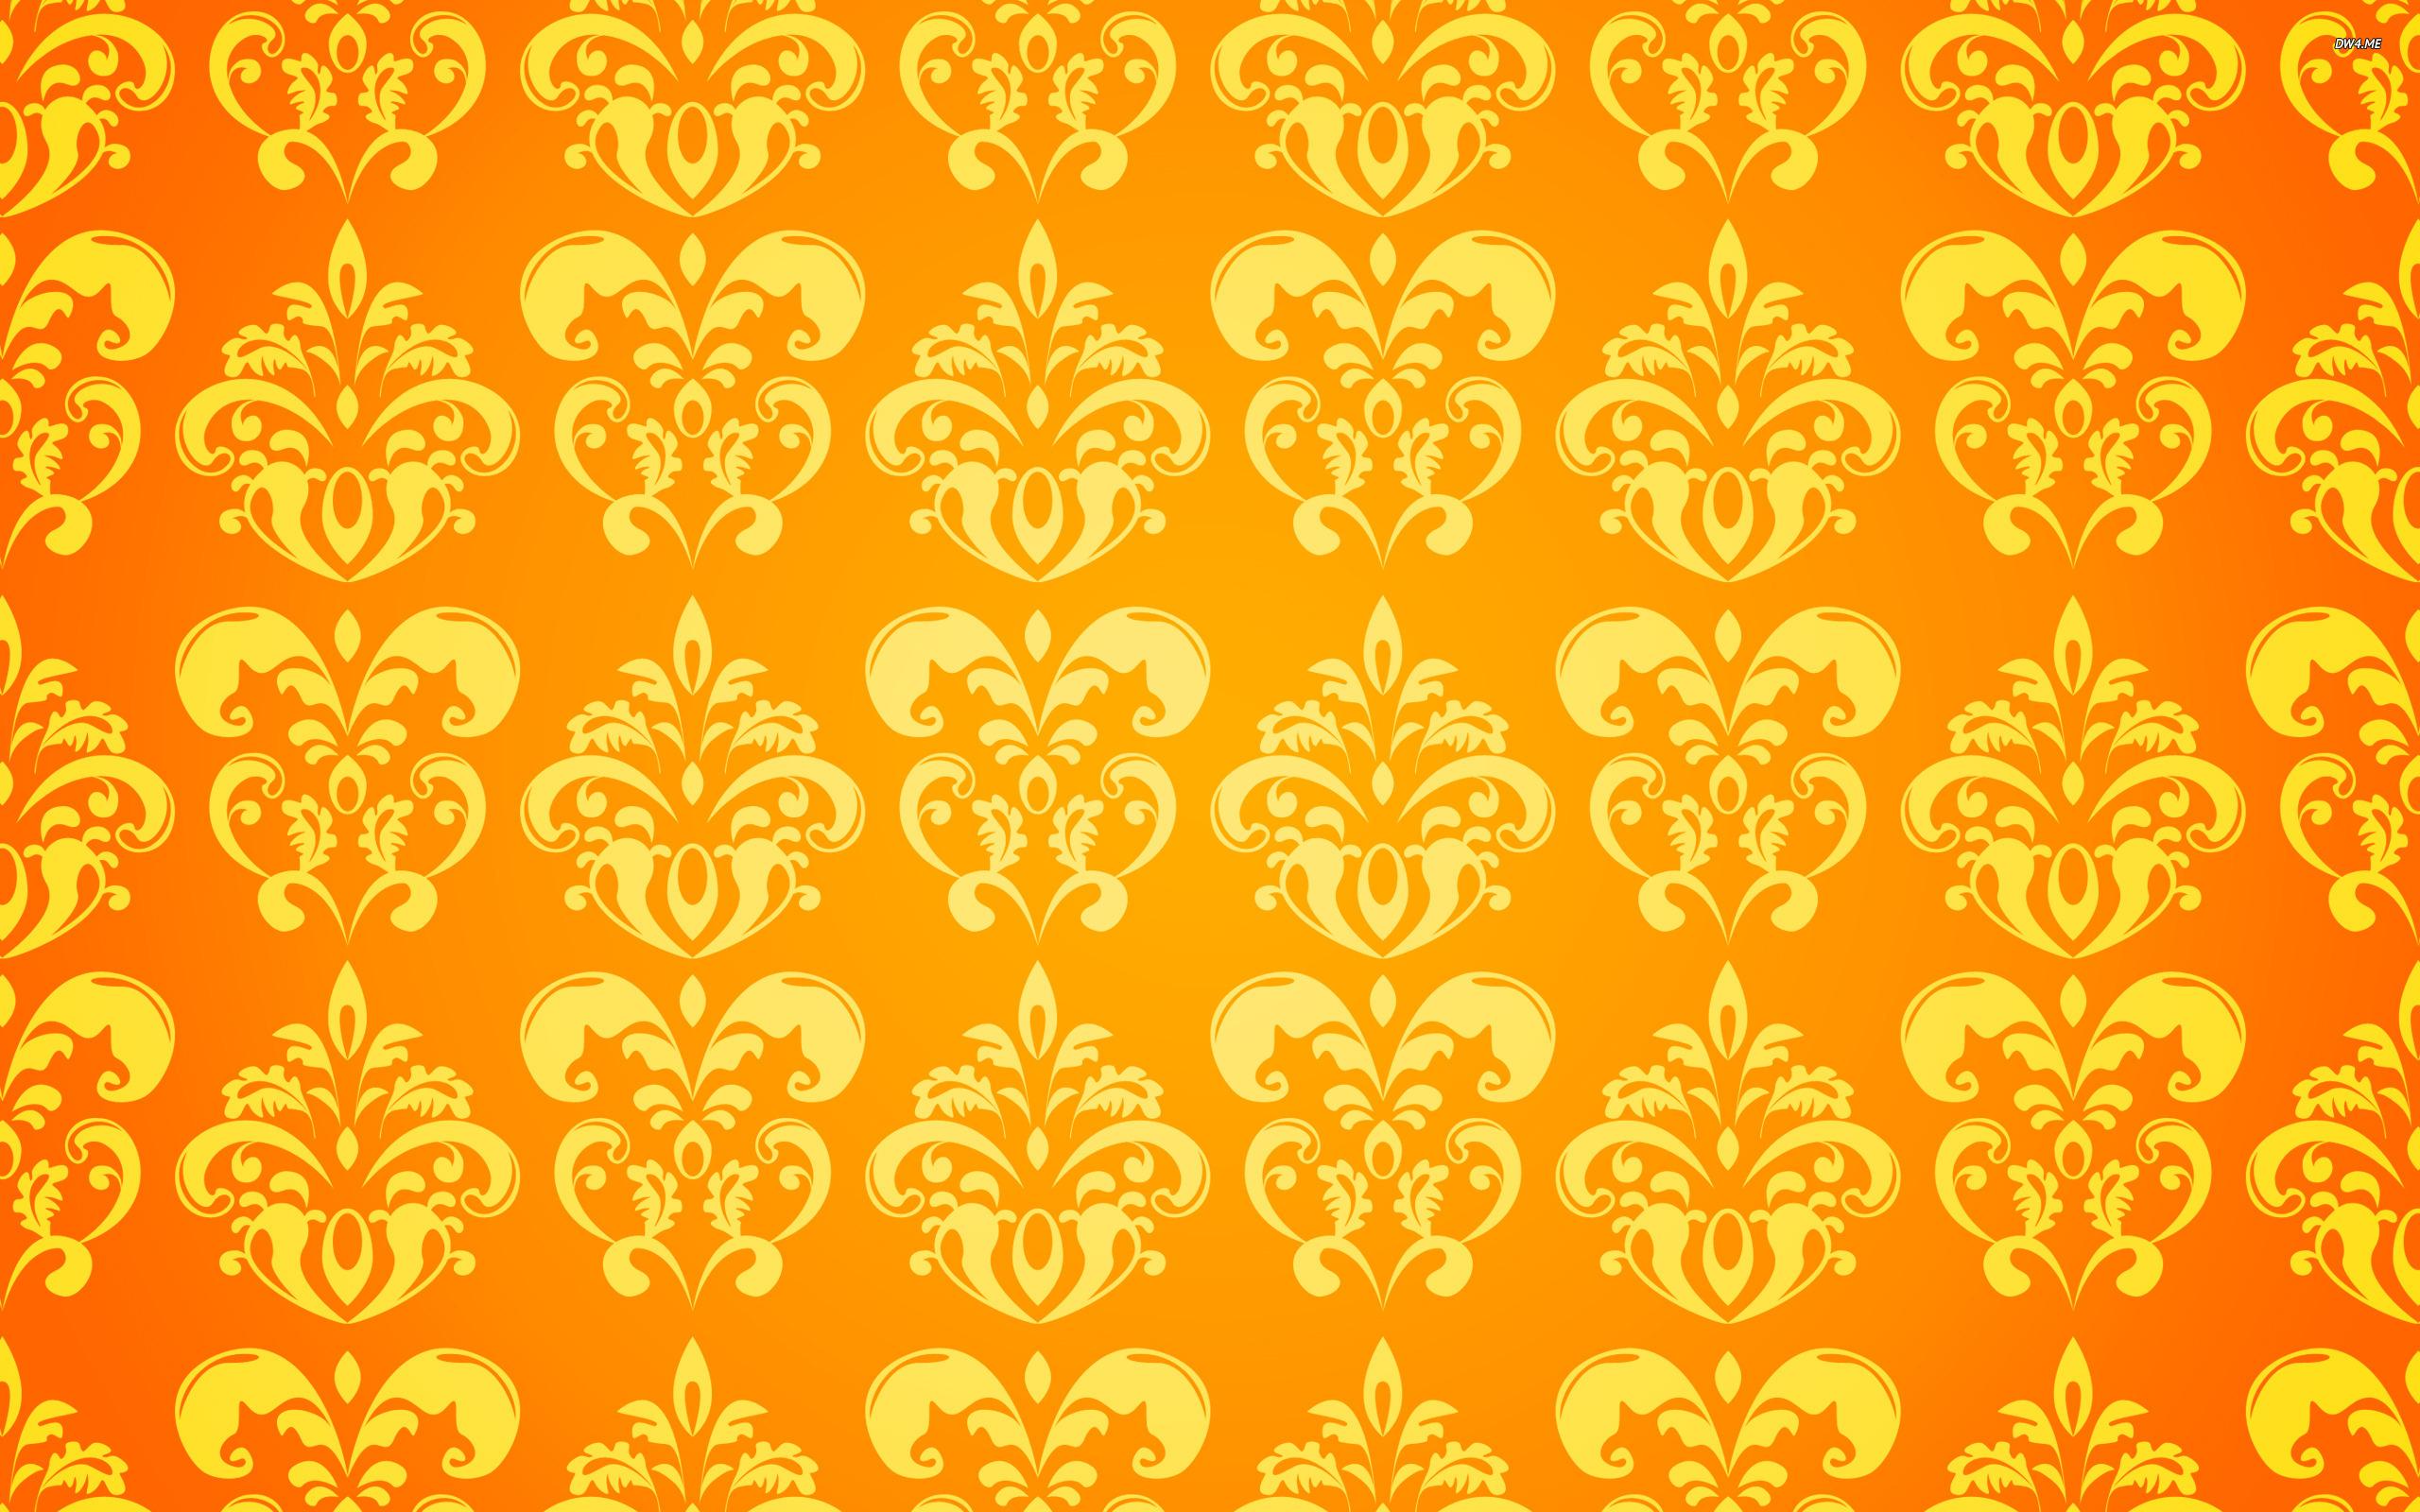 Vintage pattern wallpaper   Vector wallpapers   868 2560x1600